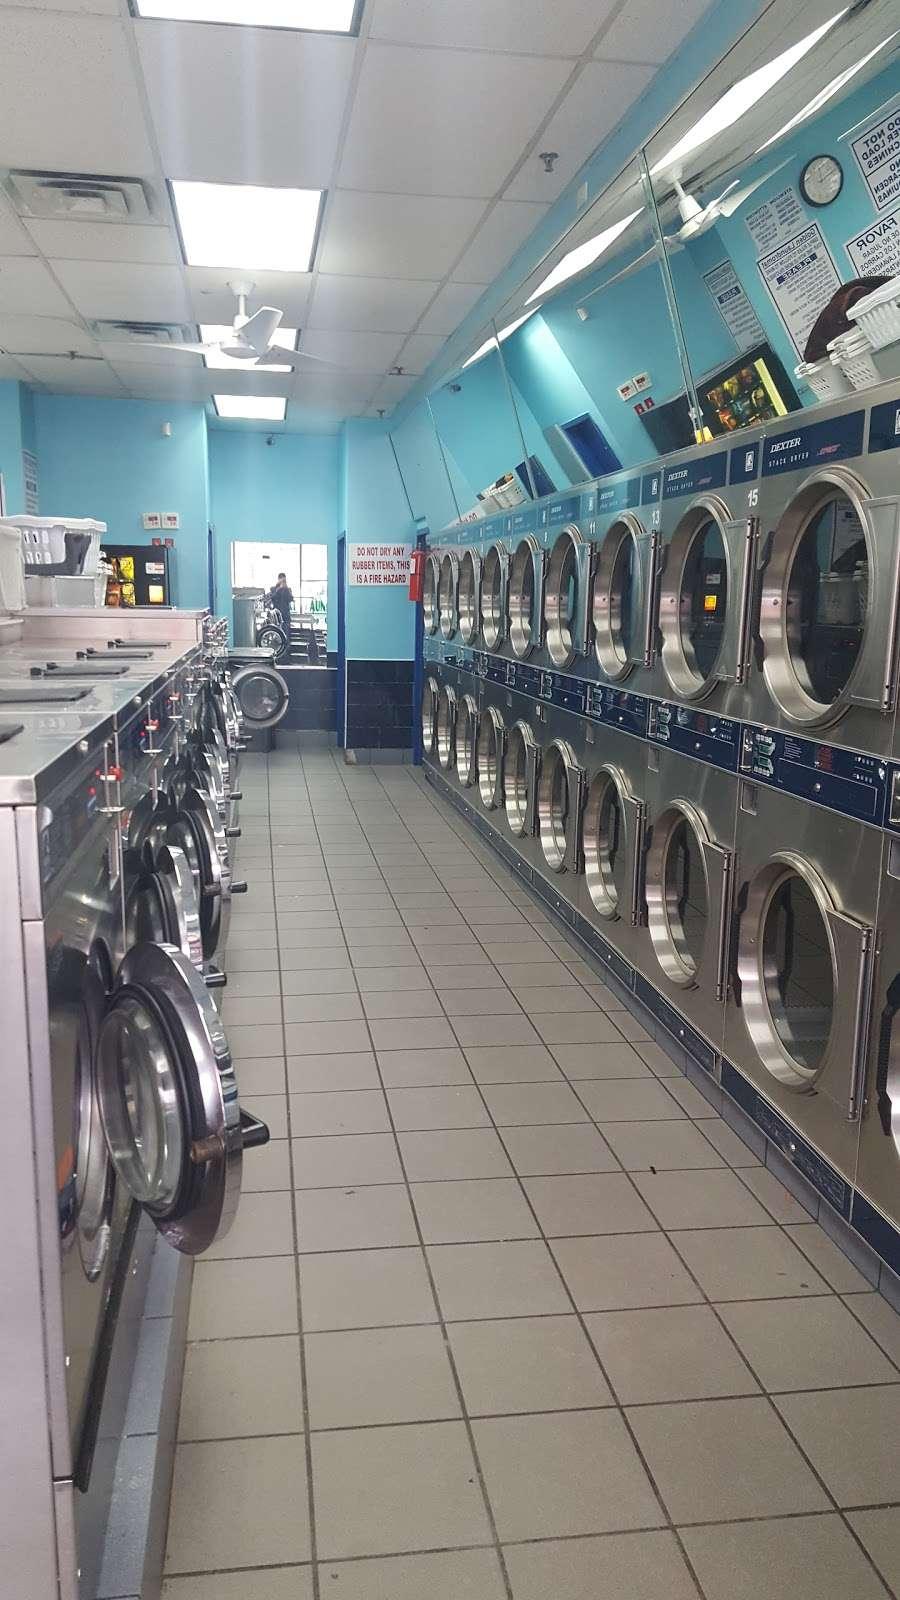 Golden Laundromat - laundry  | Photo 3 of 4 | Address: 1615 Dr Martin Luther King Jr Blvd, Bronx, NY 10453, USA | Phone: (718) 618-0234